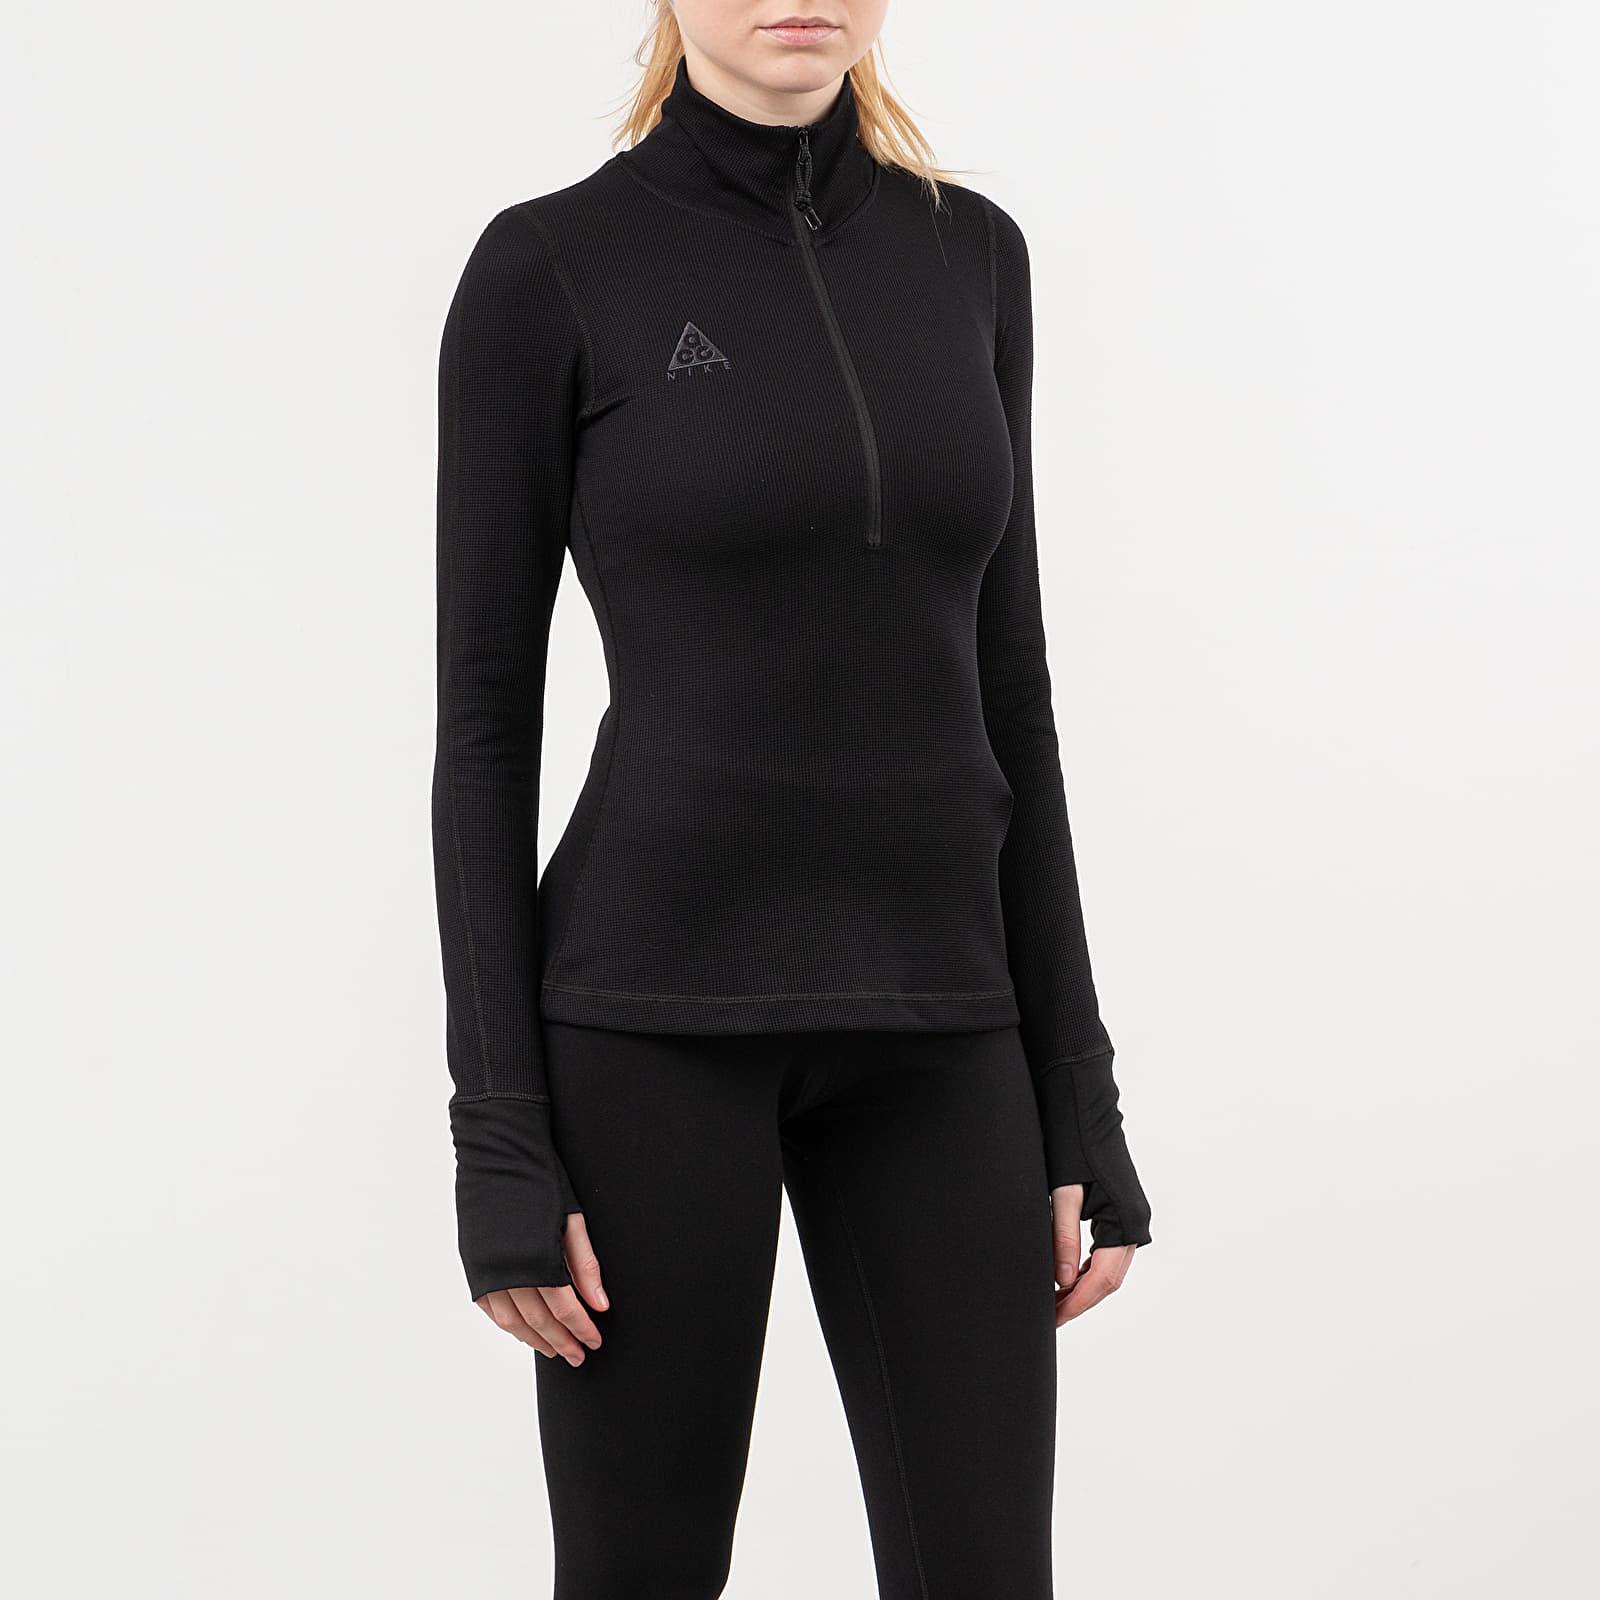 Nike NRG ACG Long Sleeve Thermal Top